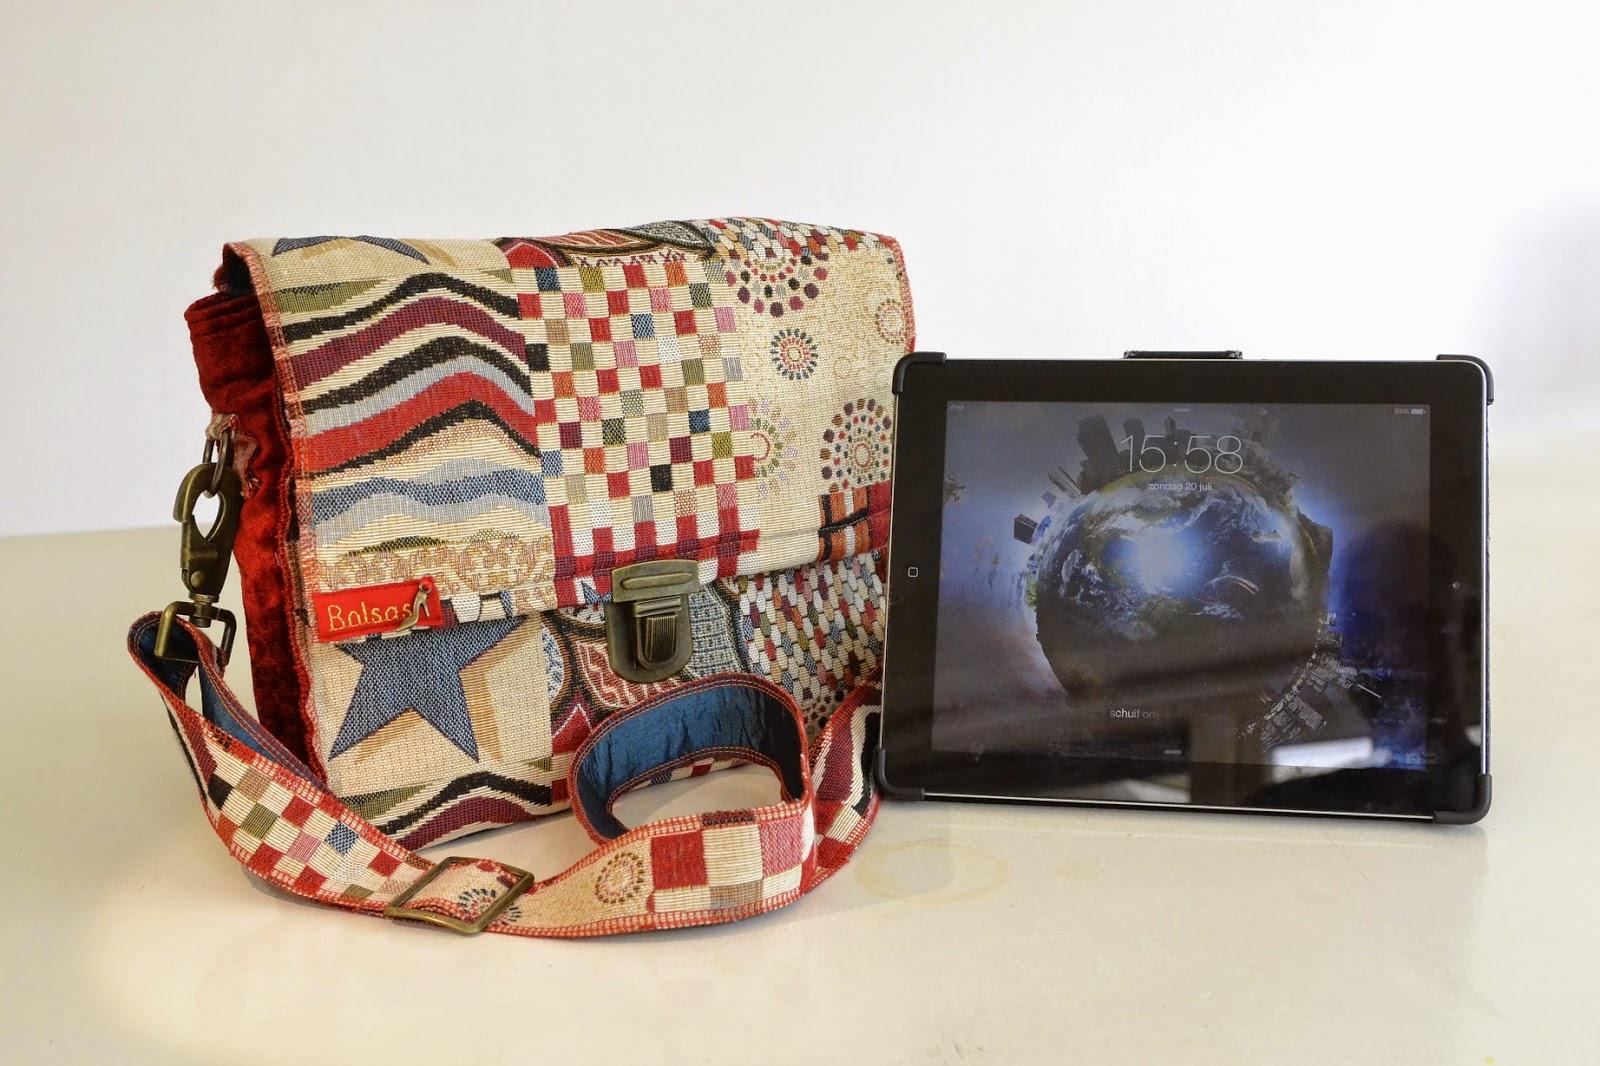 Bolsas-Tassen, unieke handgemaakte tassen, i-pad tas